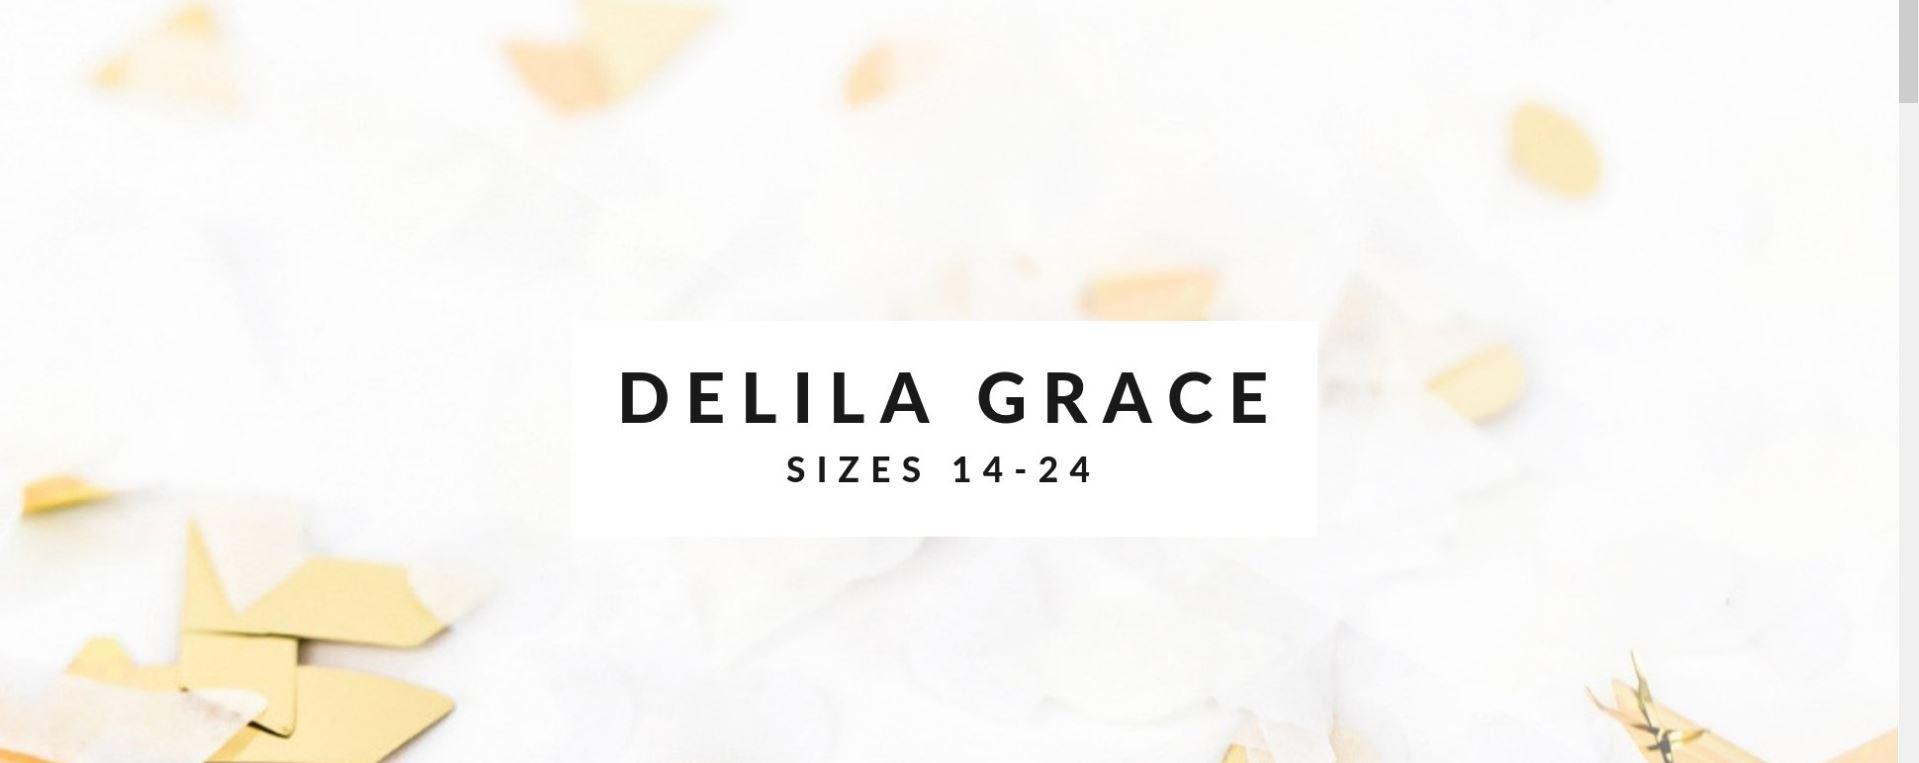 Delila Grace